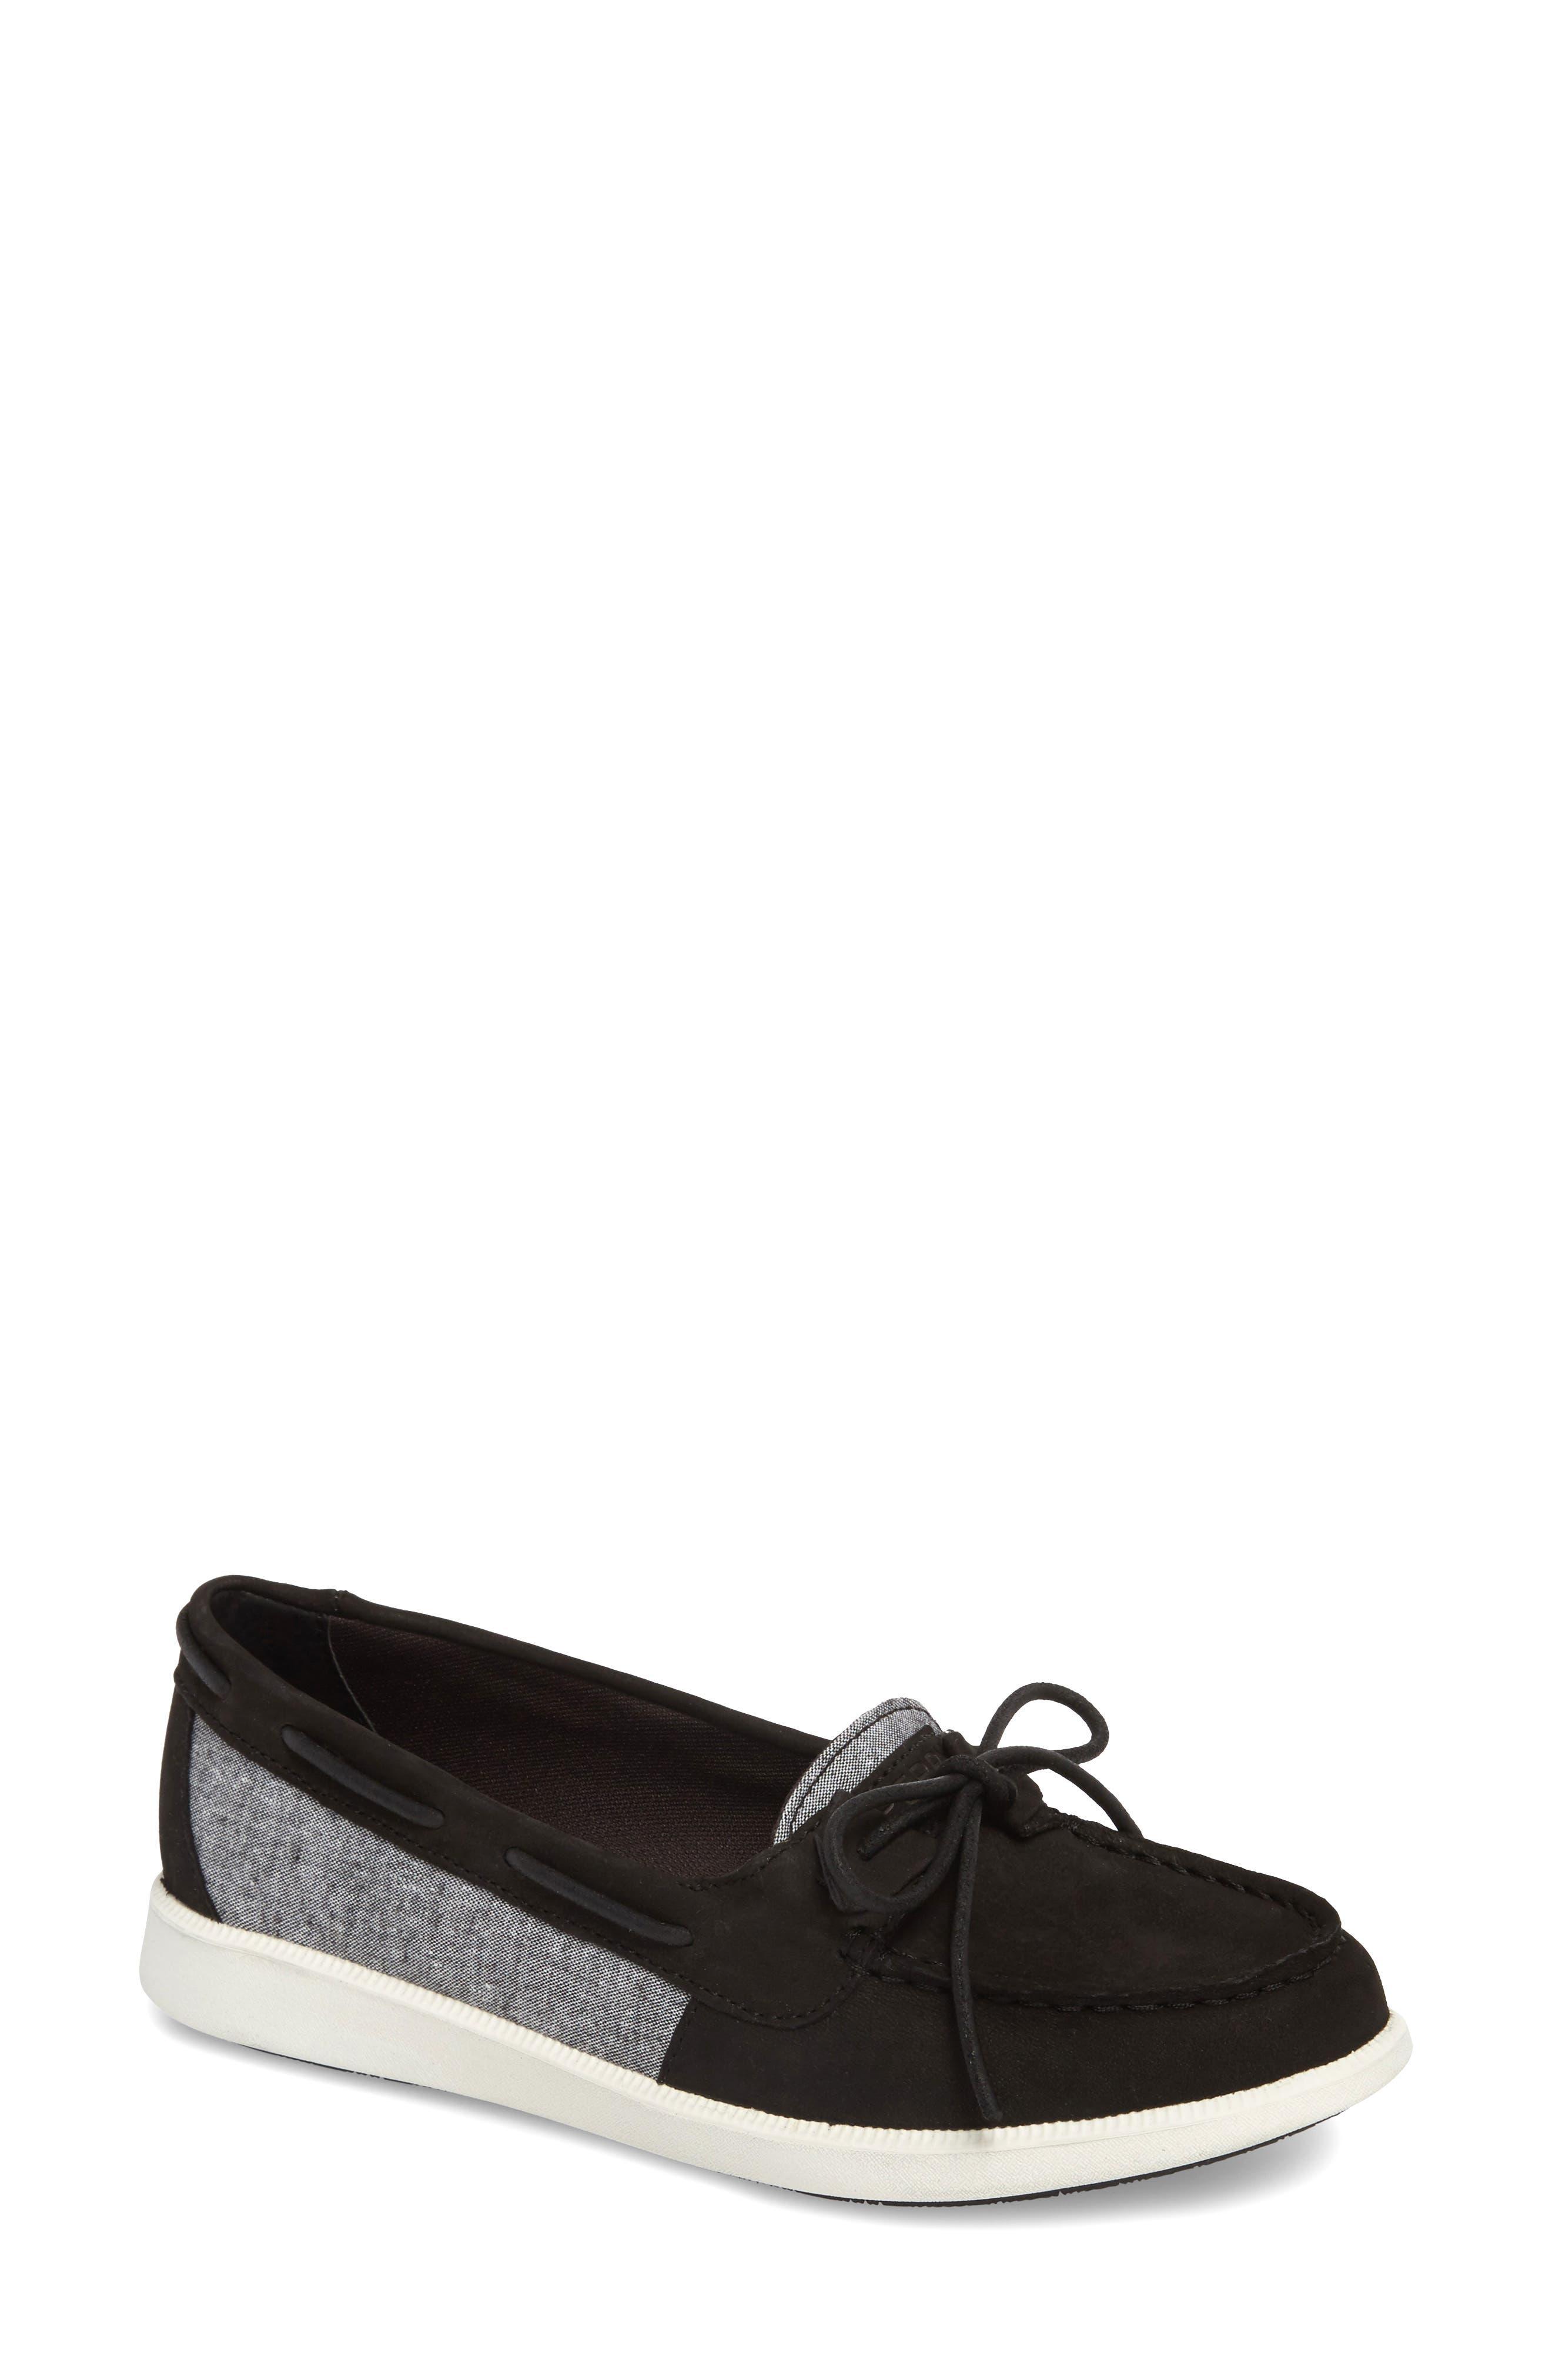 Oasis Boat Shoe,                         Main,                         color, 001